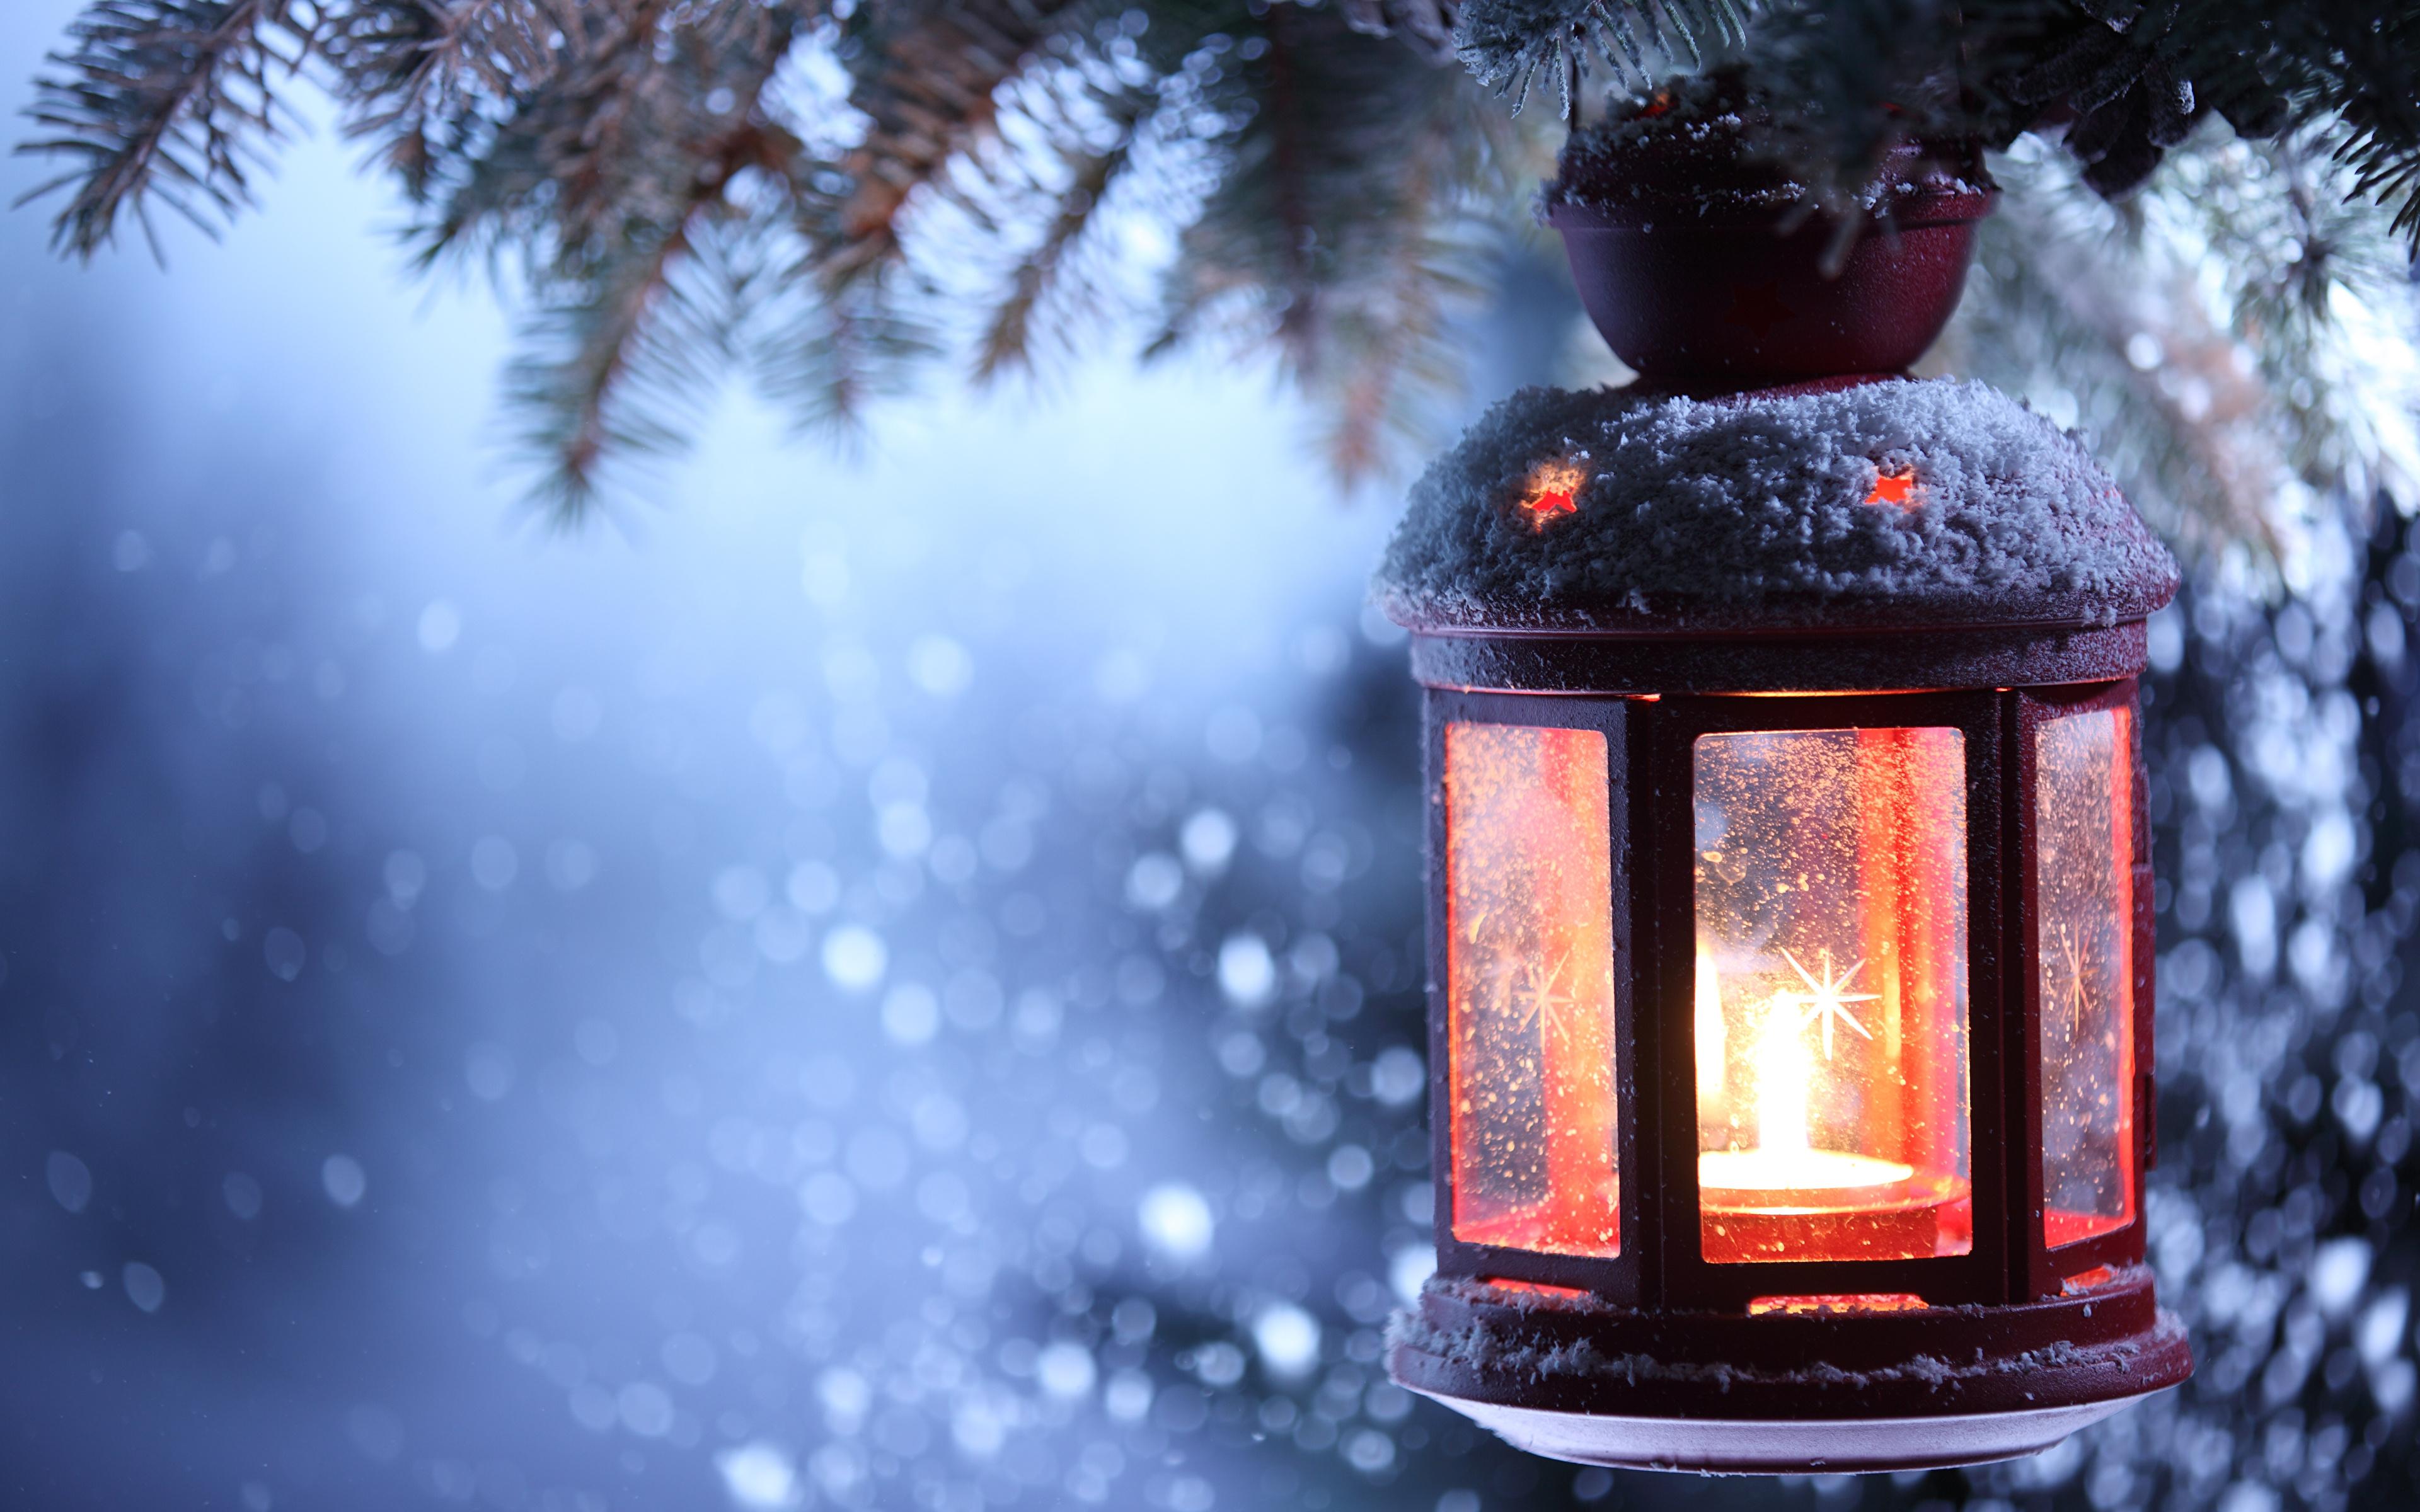 лампа свеча снег рождество lamp candle snow Christmas  № 3982693 бесплатно